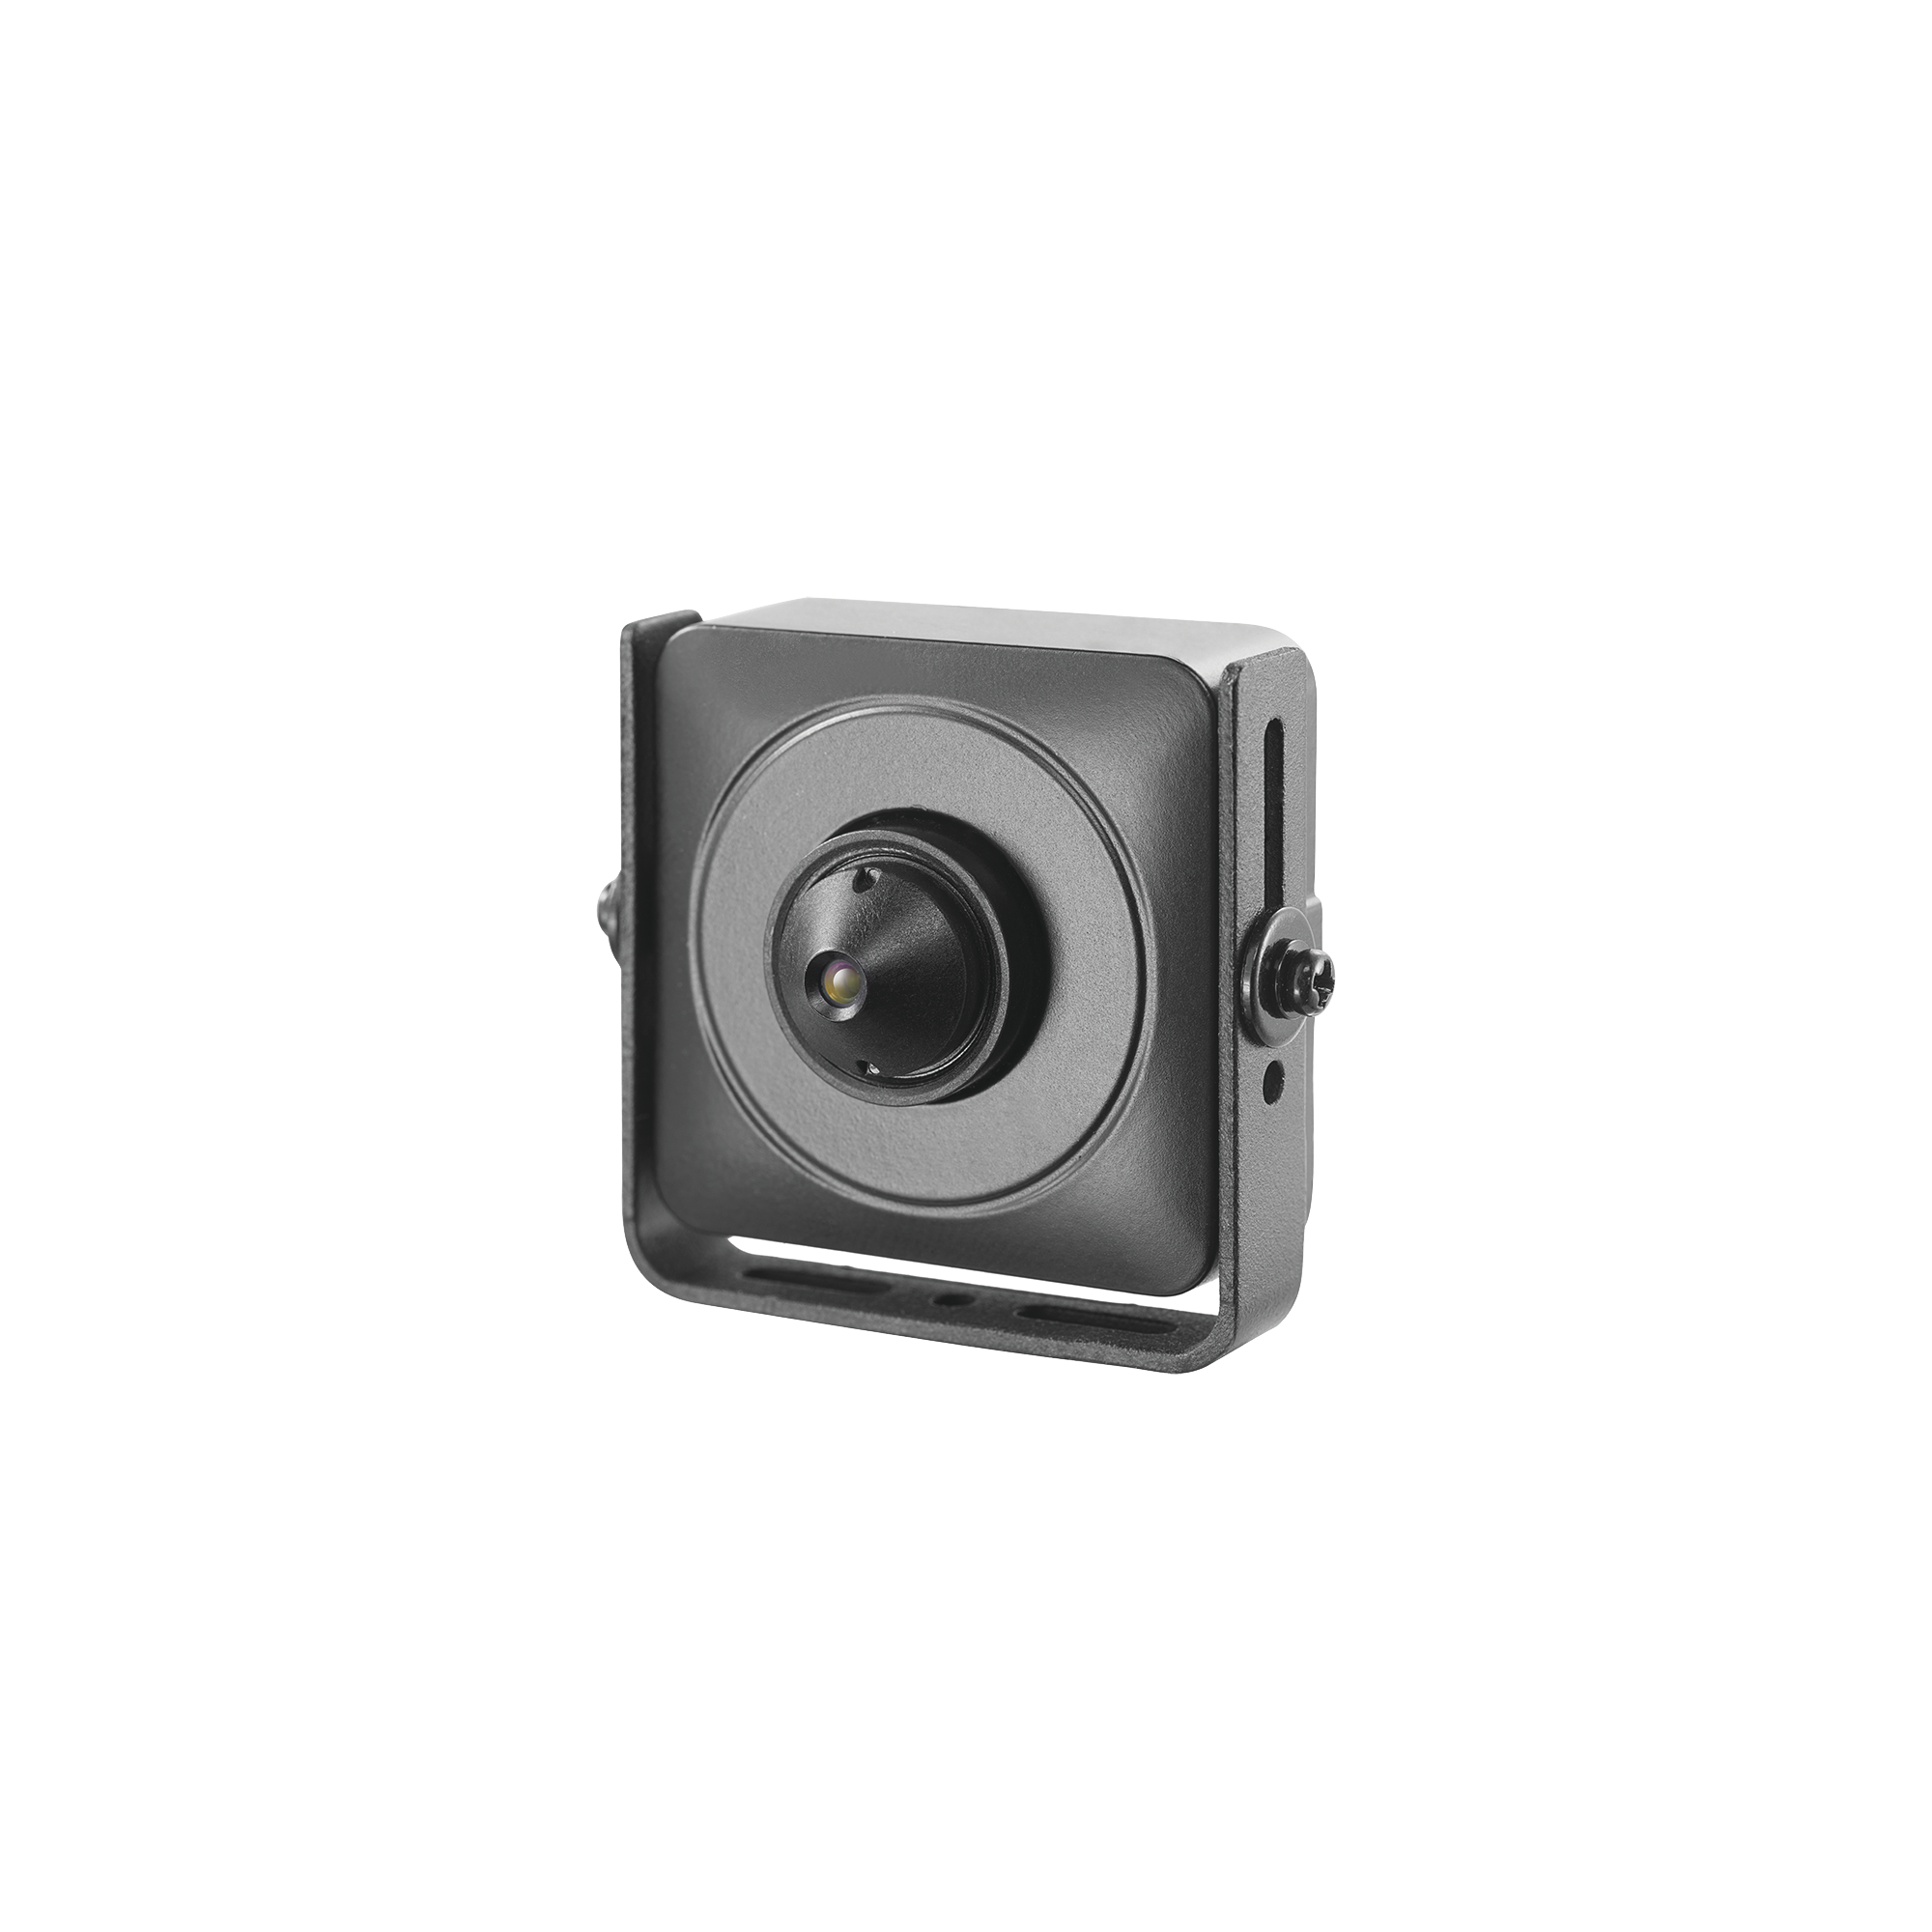 Cámara Pinhole / 1080p TURBOHD / WDR / Discreta / Lente 3.7 mm / Interior / Ultra Baja Iluminación / Salida Analógica